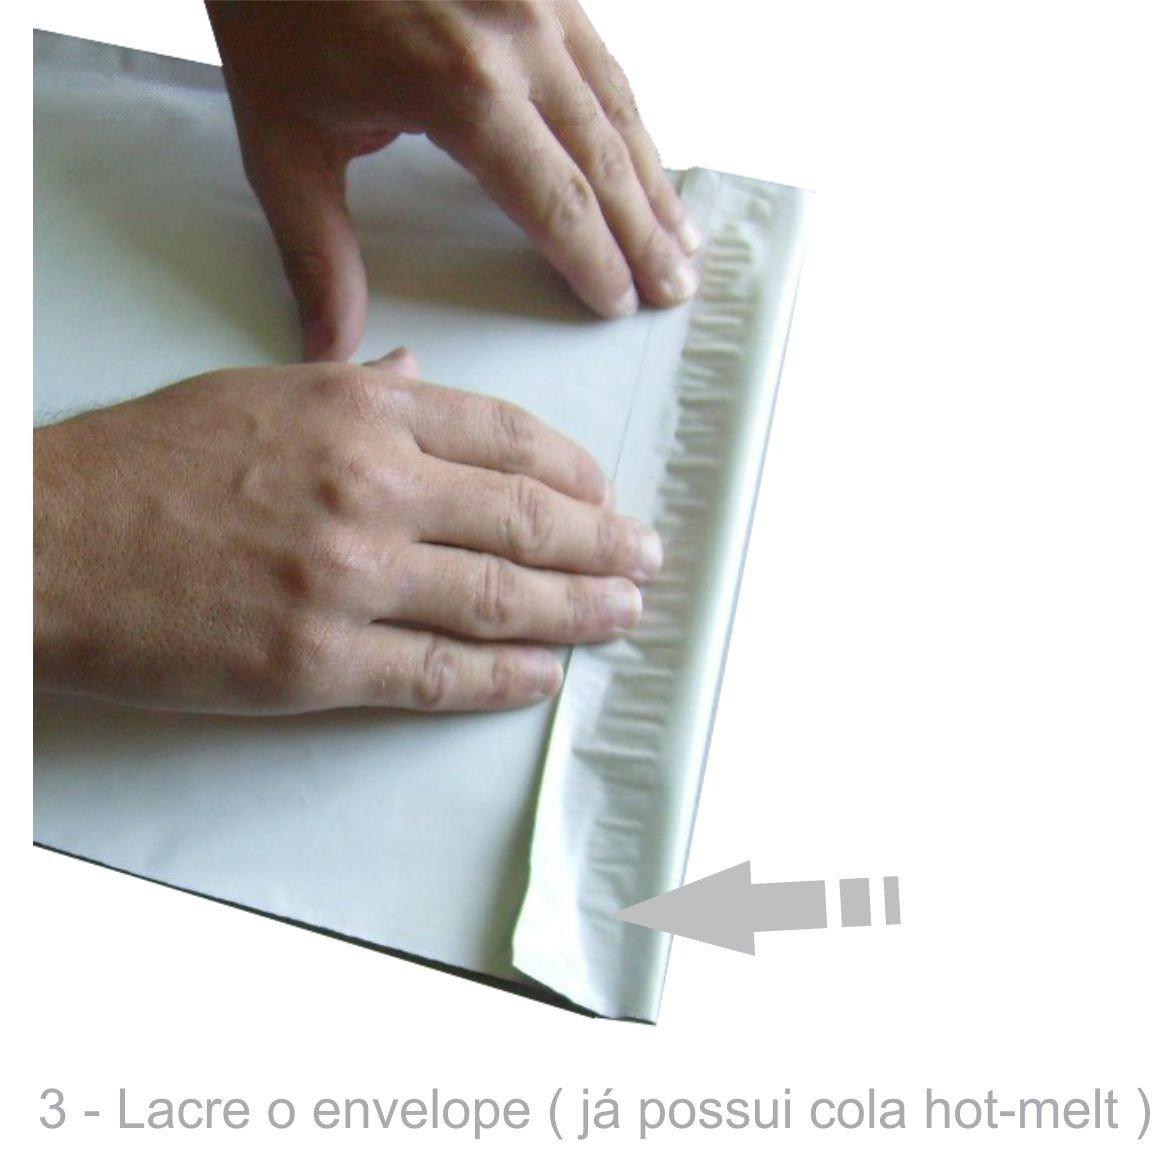 Envelope Plástico Segurança Lacre Tipo Sedex 26x36 (250 ou 500 Unidades)